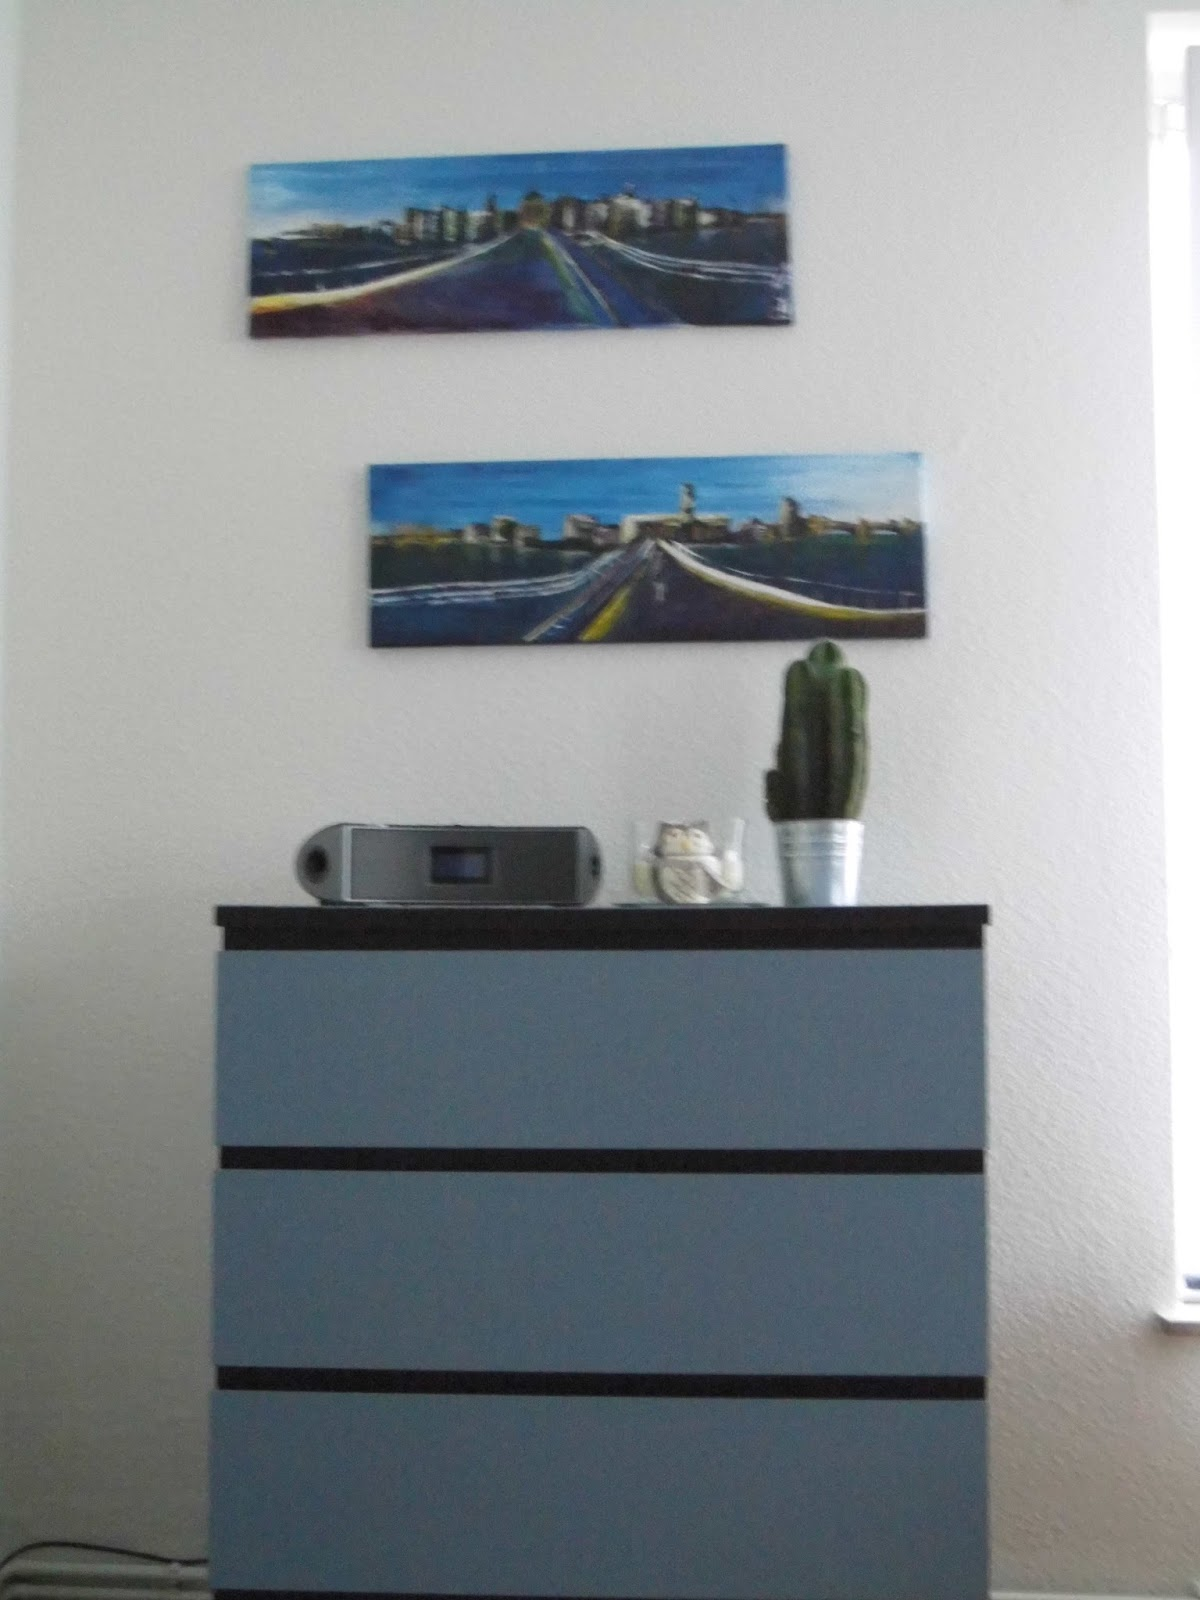 life of chris malm bekommt einen neuen anstrich ikea hack. Black Bedroom Furniture Sets. Home Design Ideas